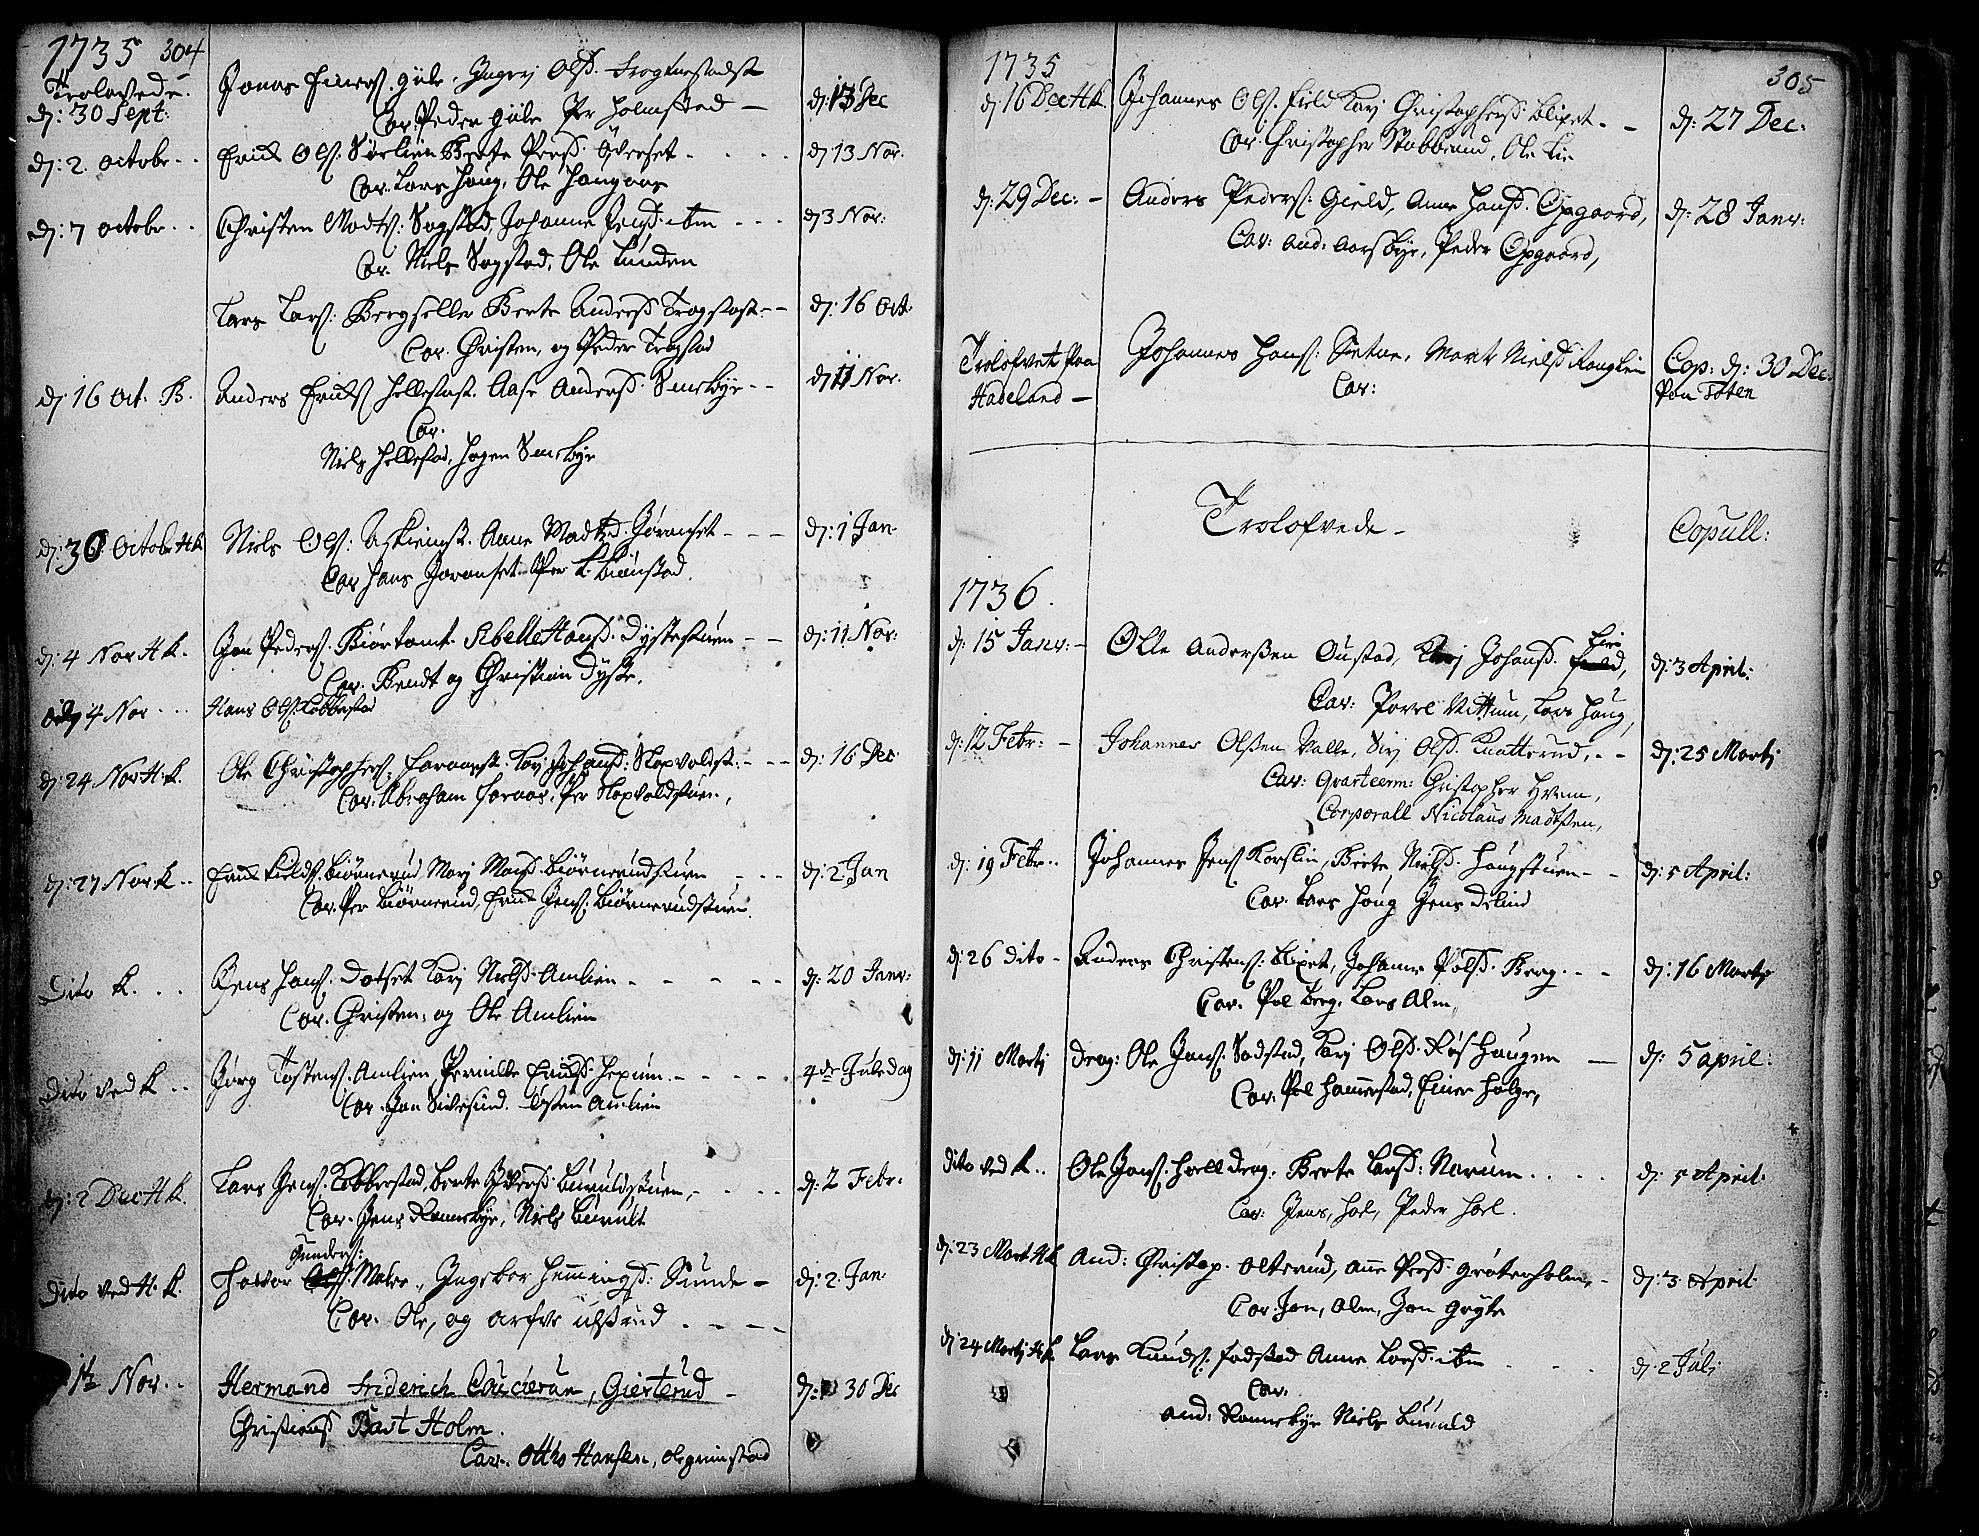 SAH, Toten prestekontor, Ministerialbok nr. 3, 1734-1751, s. 304-305